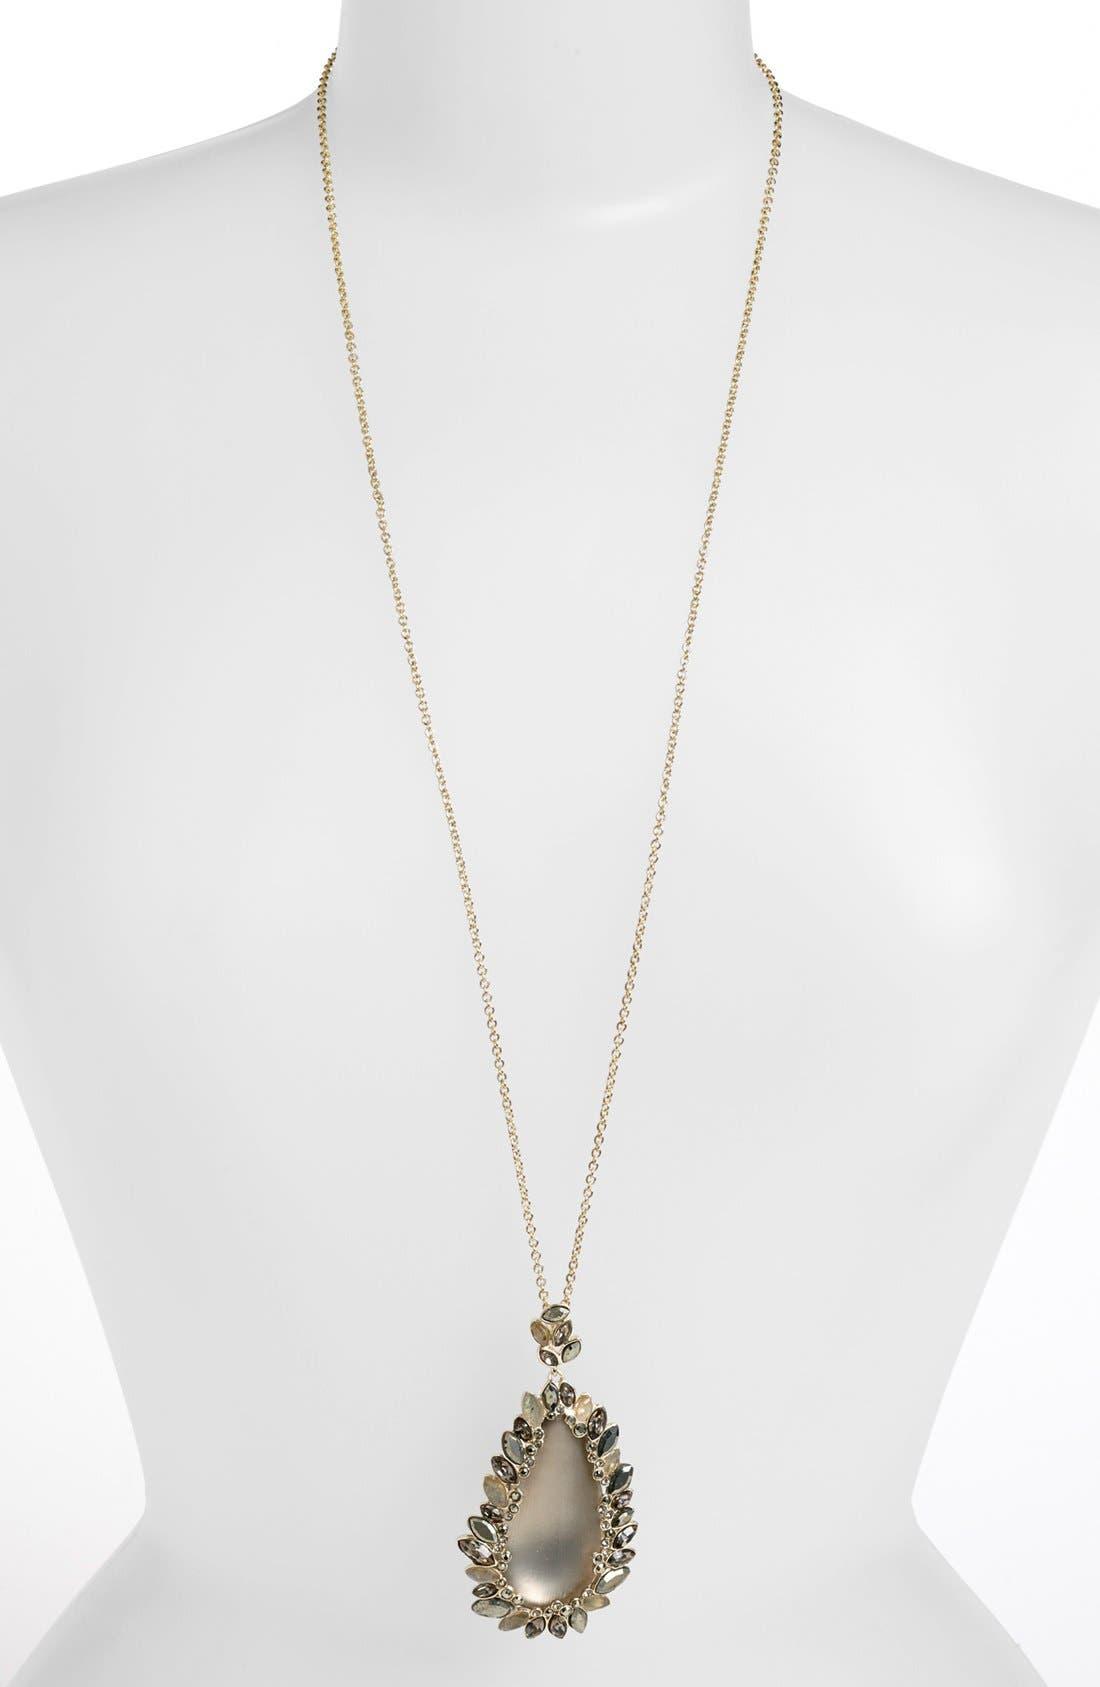 Main Image - Alexis Bittar 'Lucite® - Neo Bohemian' Long Paisley Pendant Necklace